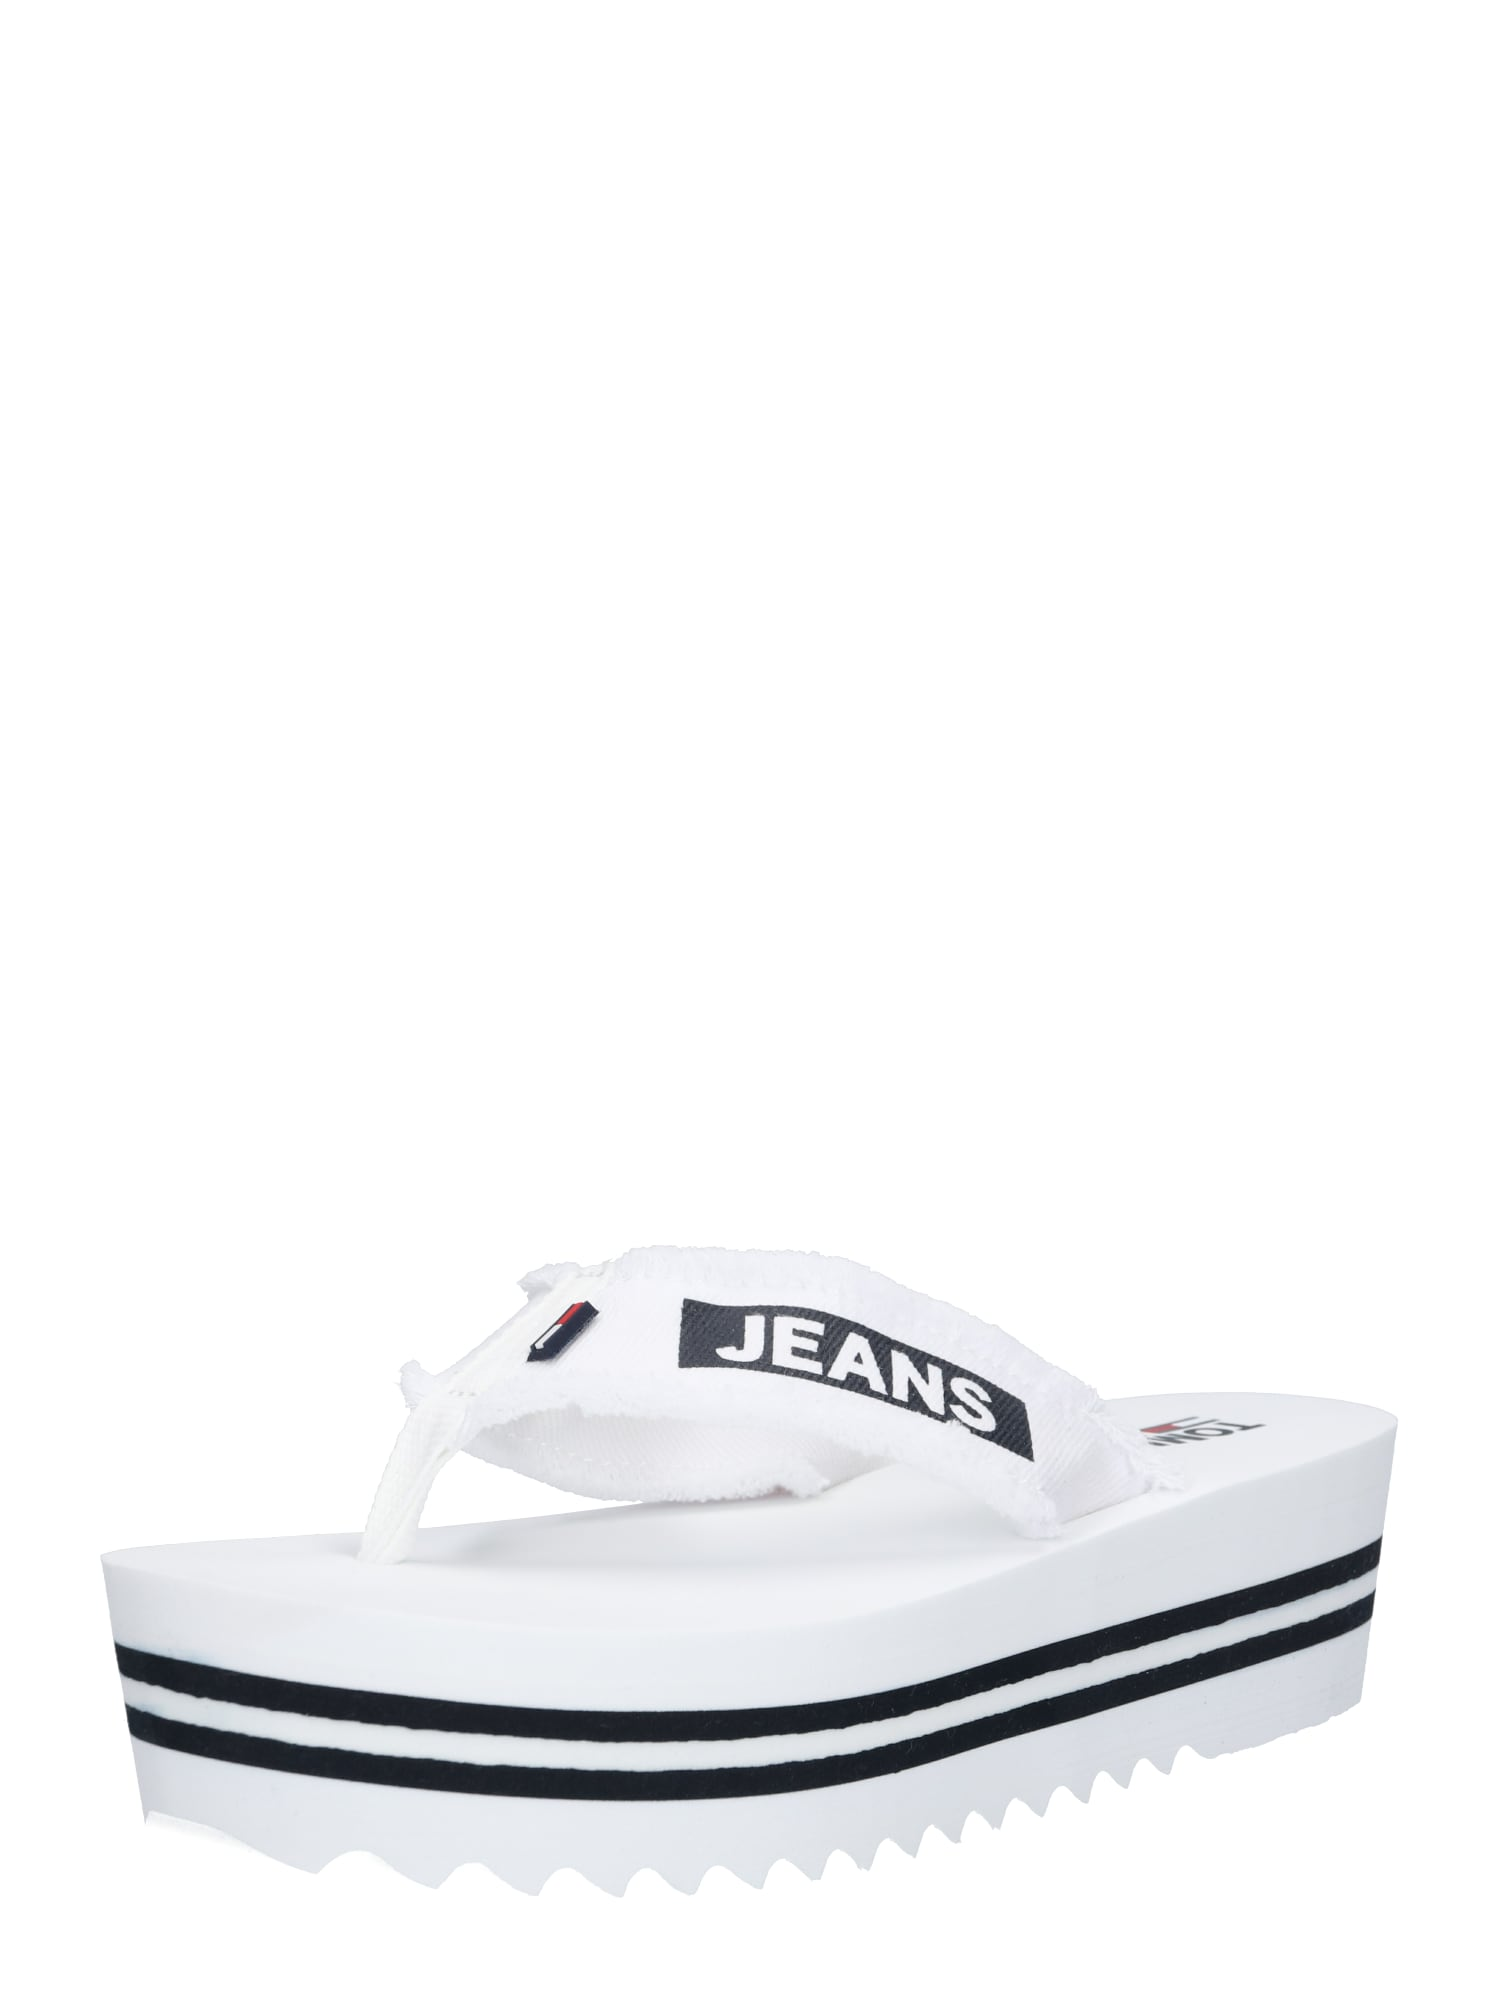 Pantofle DENIM MID BEACH SANDAL bílá Tommy Jeans